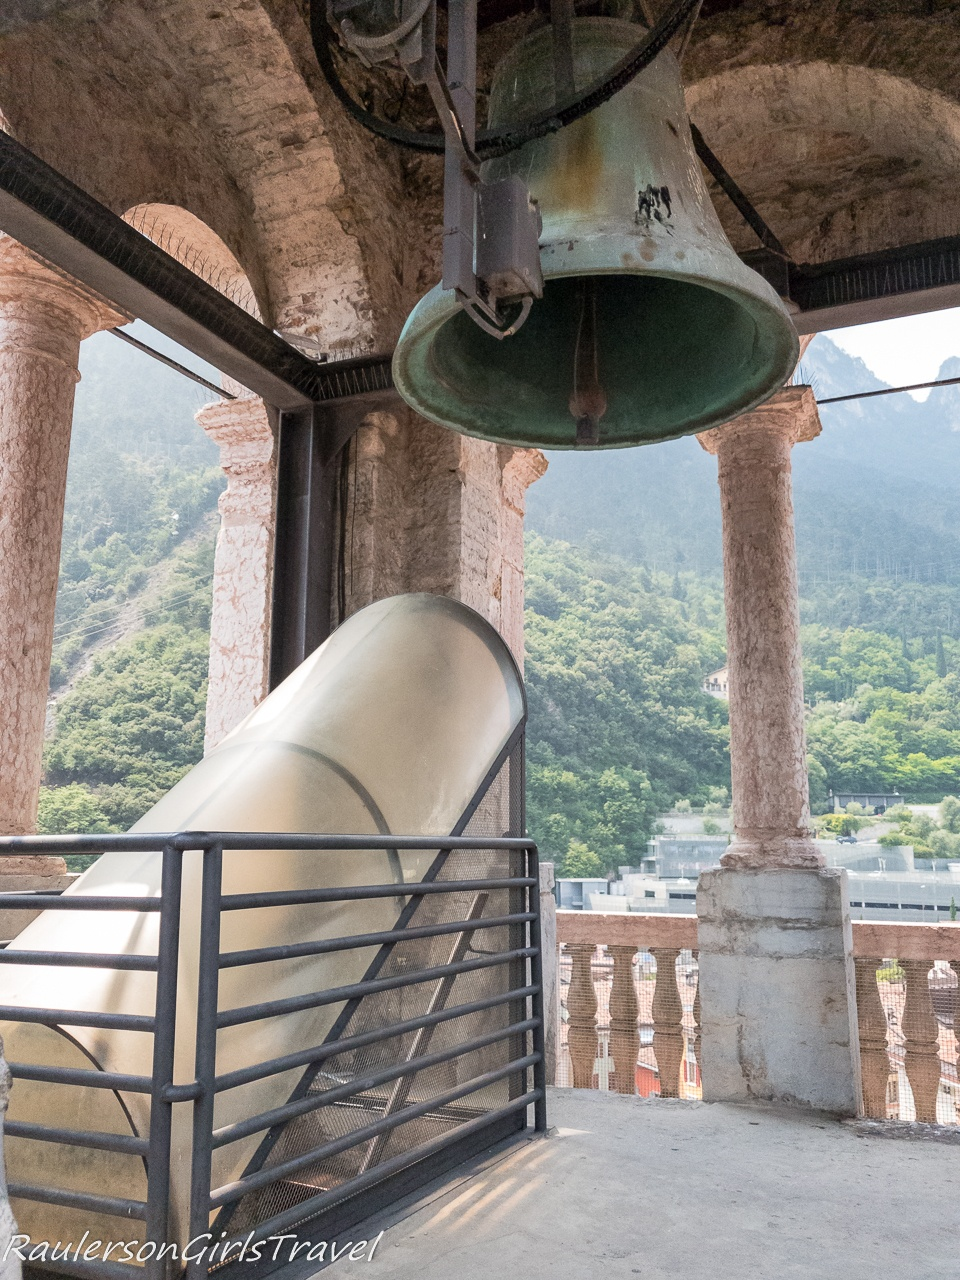 top of the Apponale Tower in Riva del Garda